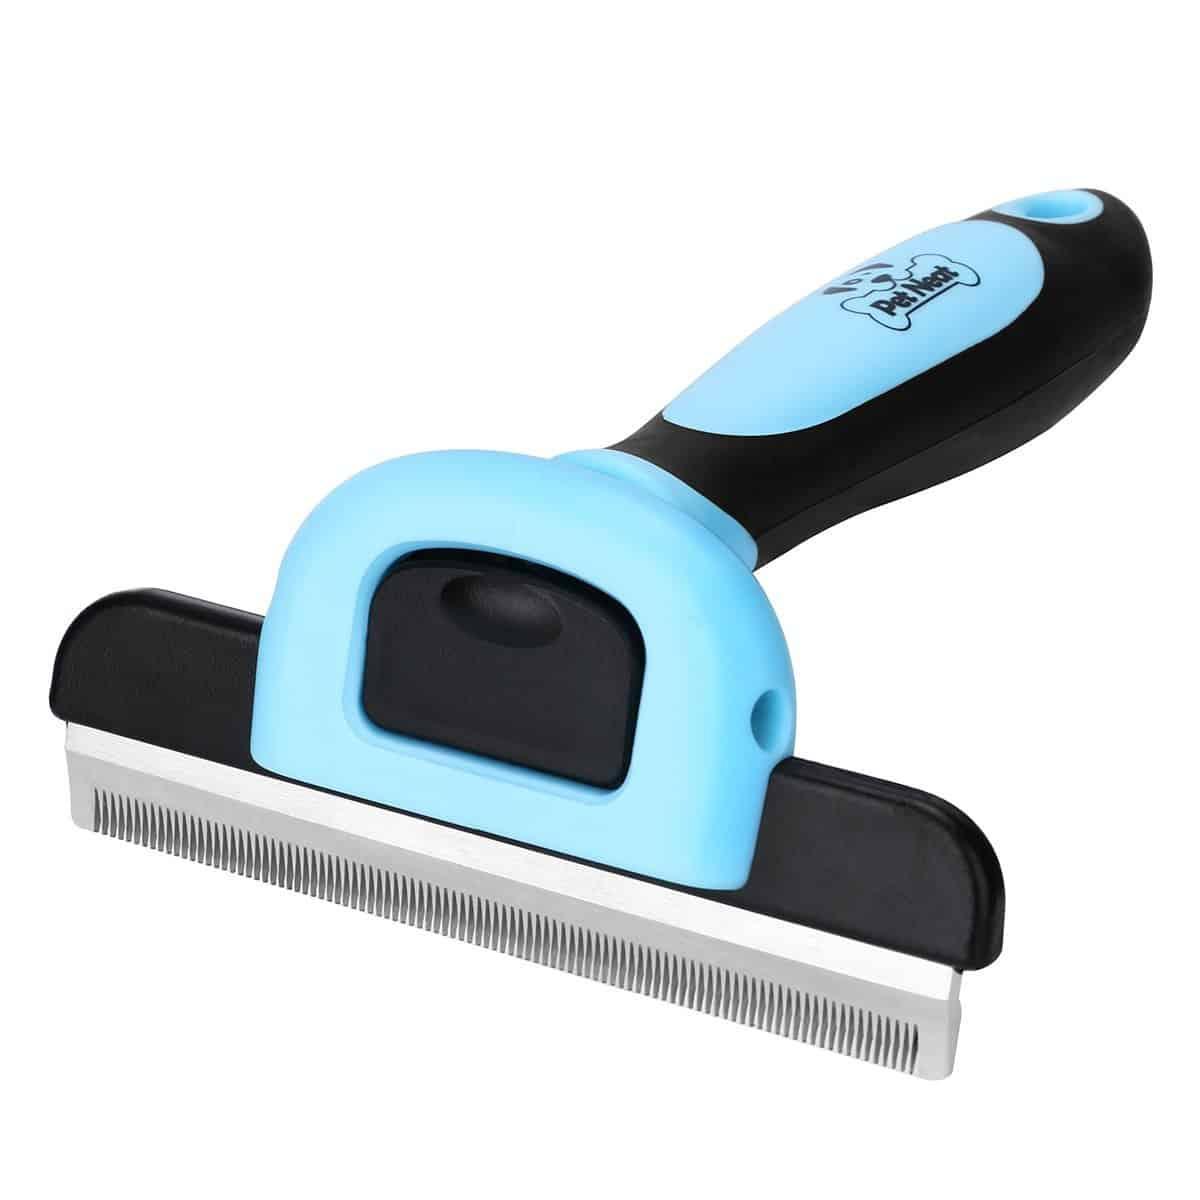 Pet Grooming De-Shedding Tool